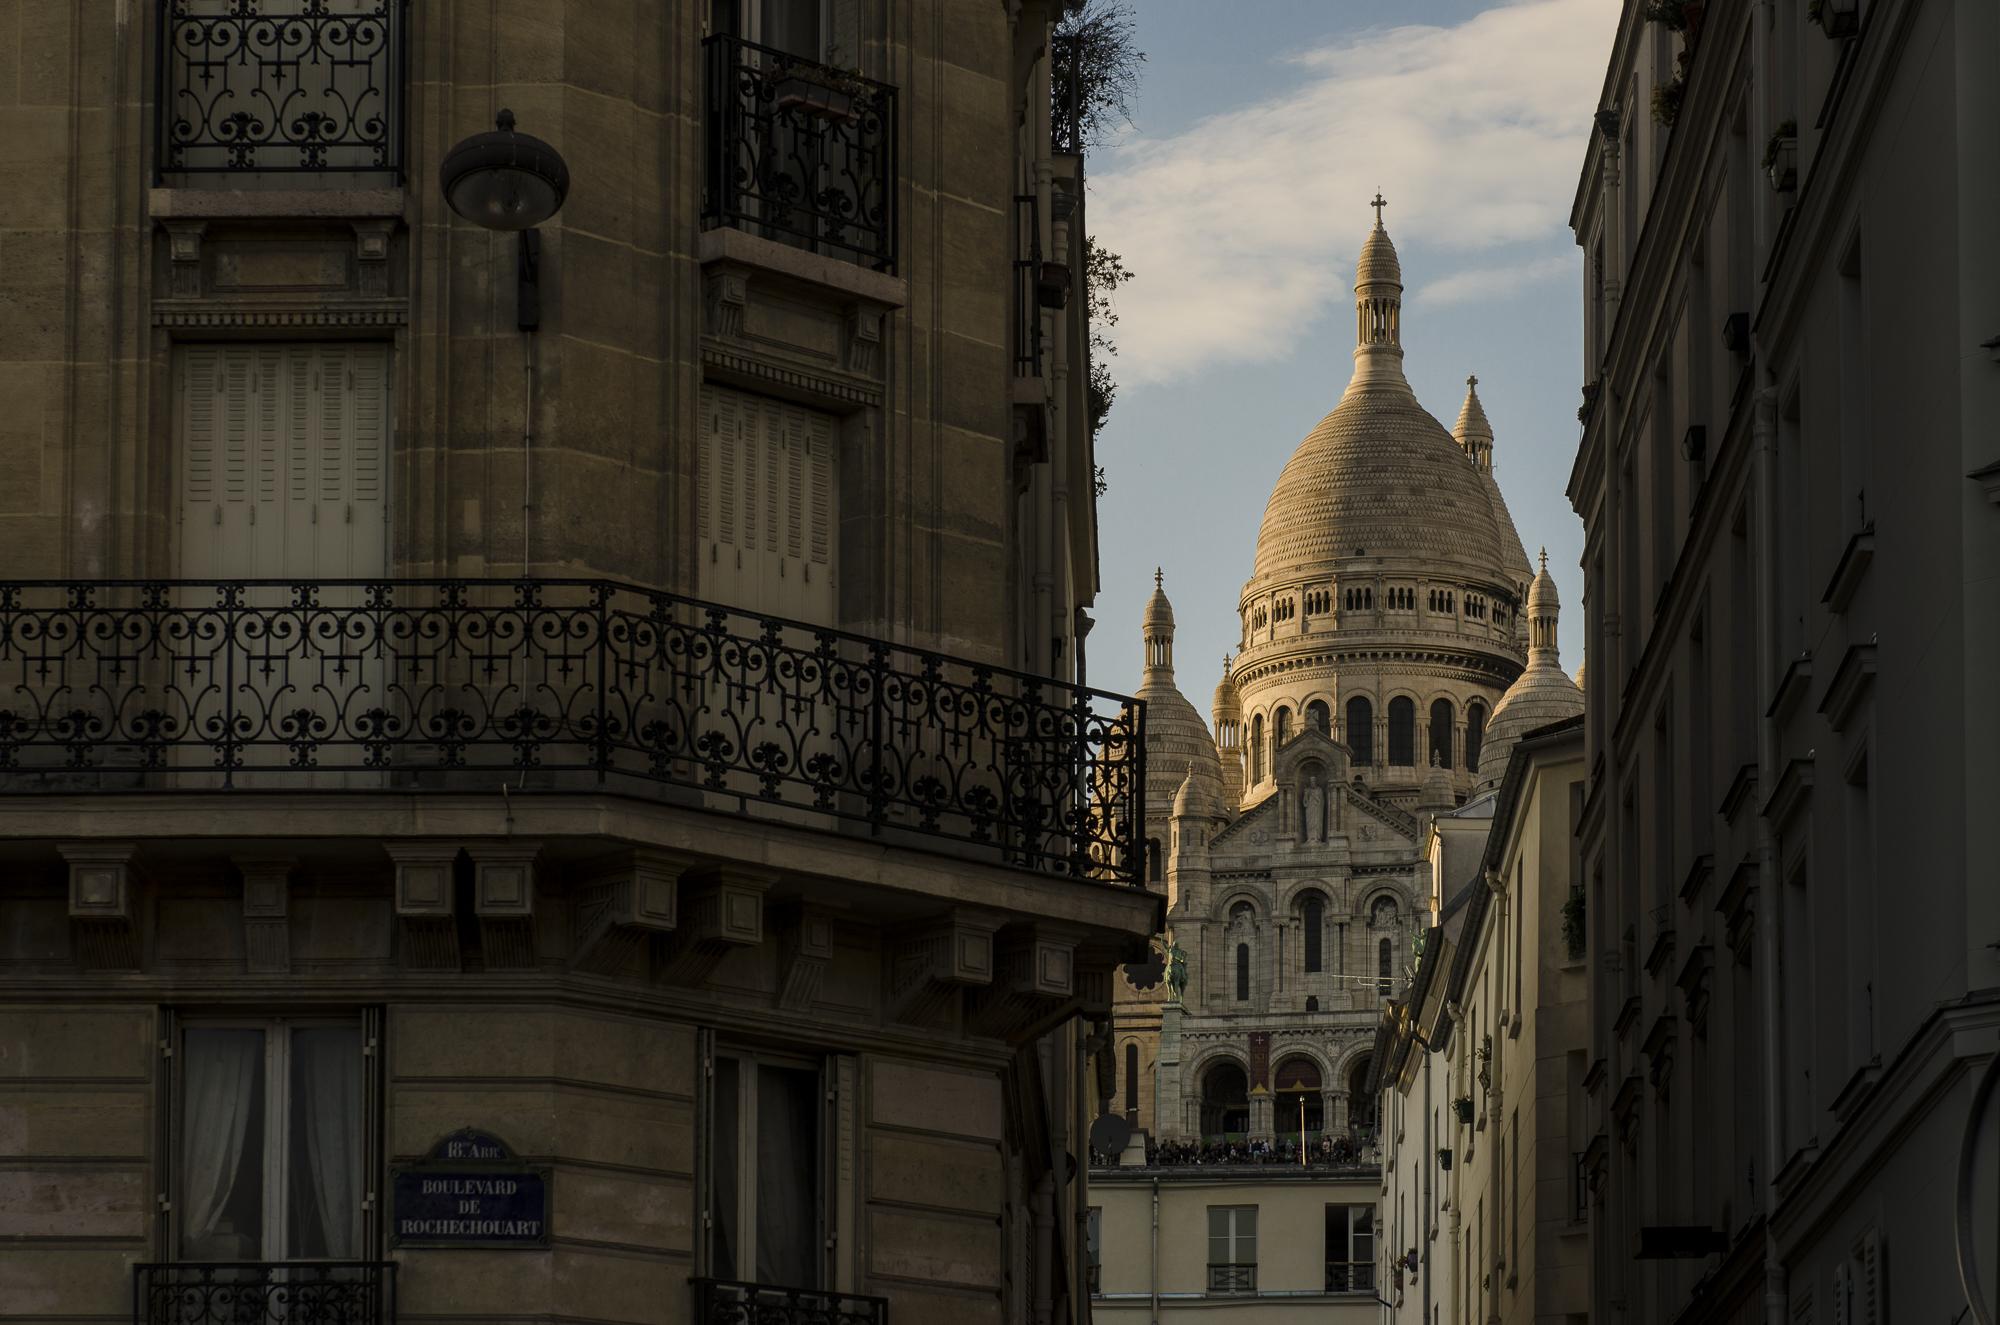 Sacré Cœr - Paris  PHOTOGRAPHY: ALEXANDER J.E. BRADLEY • NIKON D7000 • AF-S NIKKOR 24-70mm ƒ/2.8G ED @ 66MM • ƒ/8 • 1/125 • ISO 100